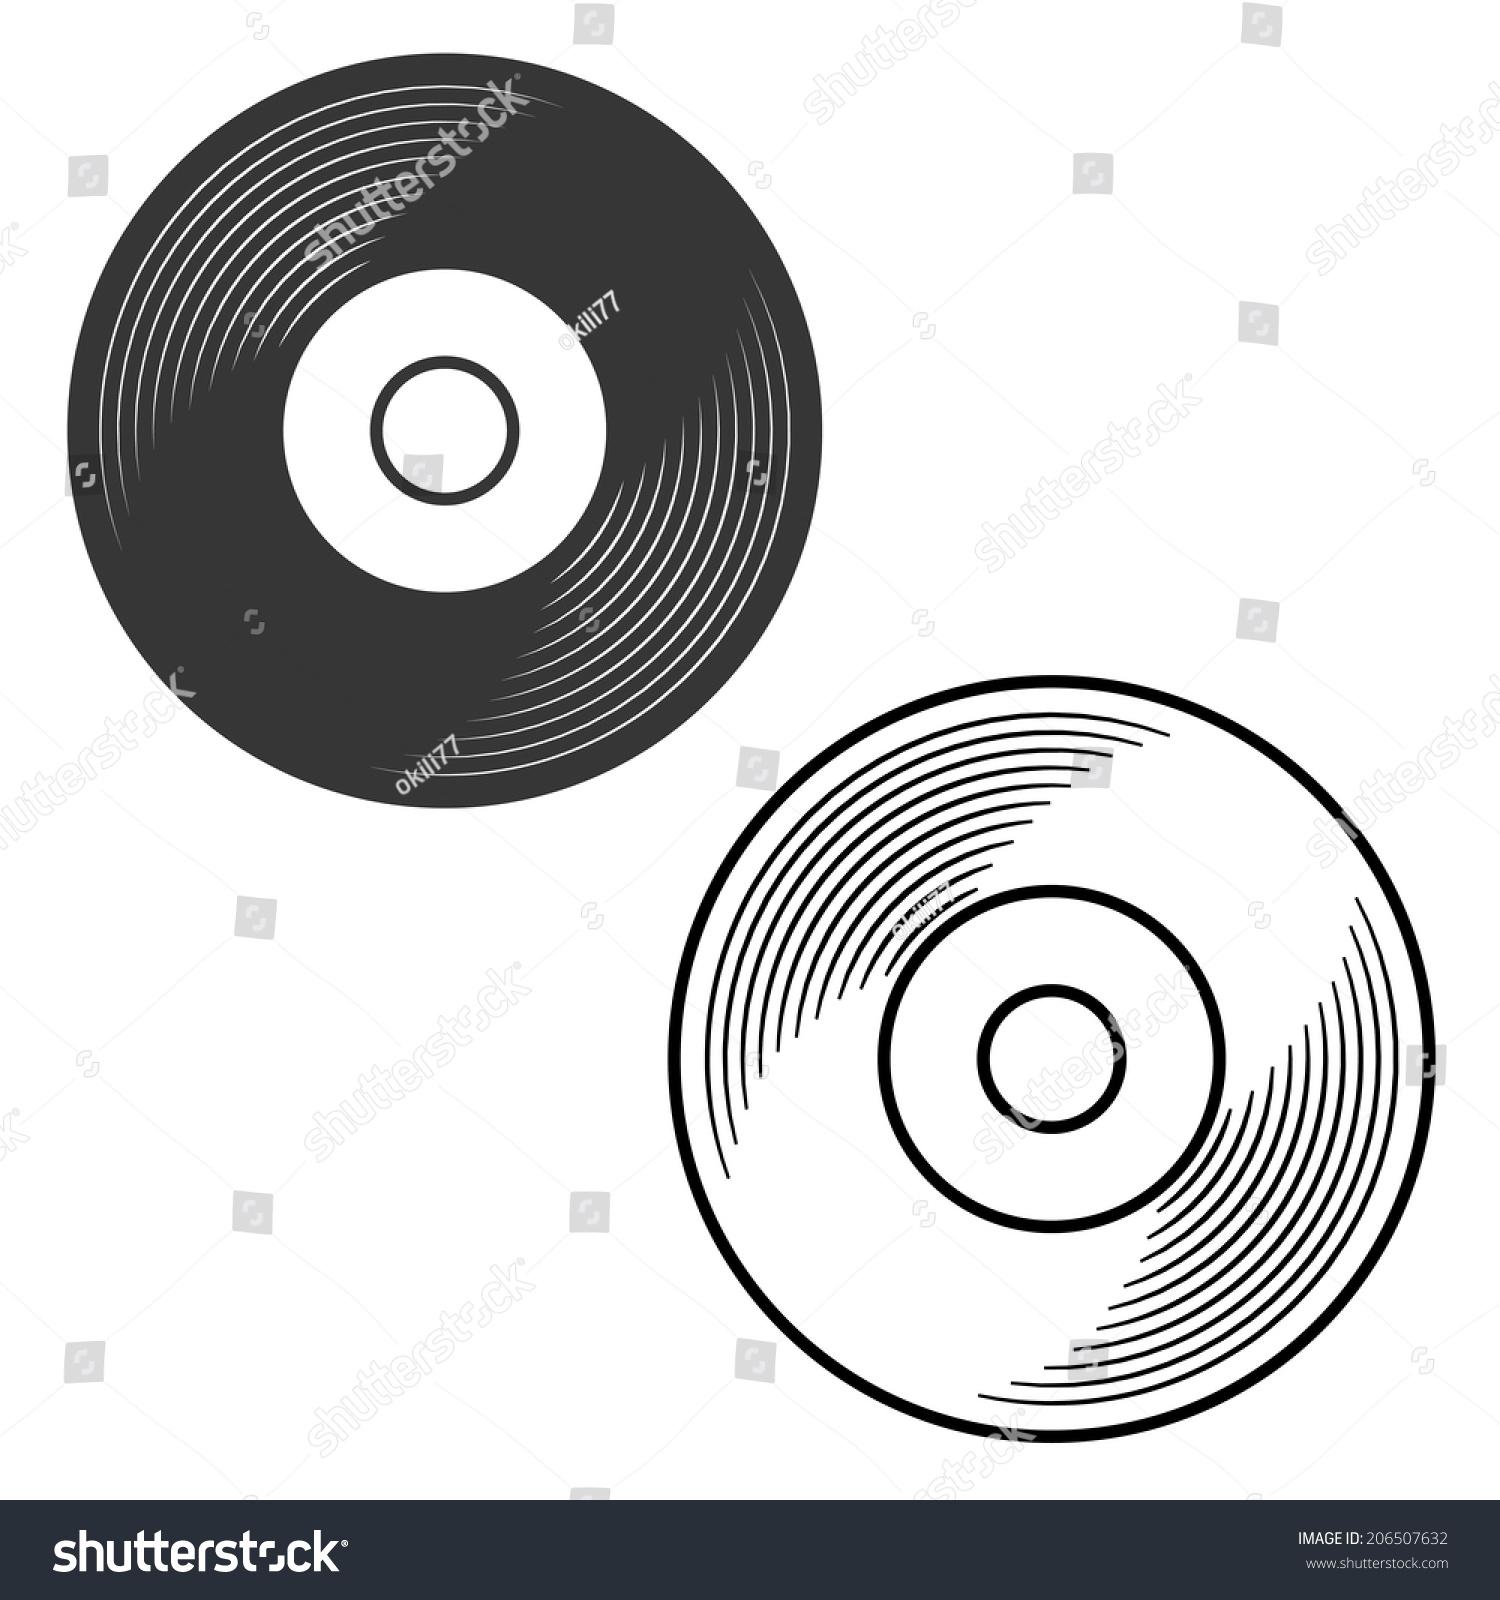 Vinyl Record Silhouette Outline Illustration Vector Stock